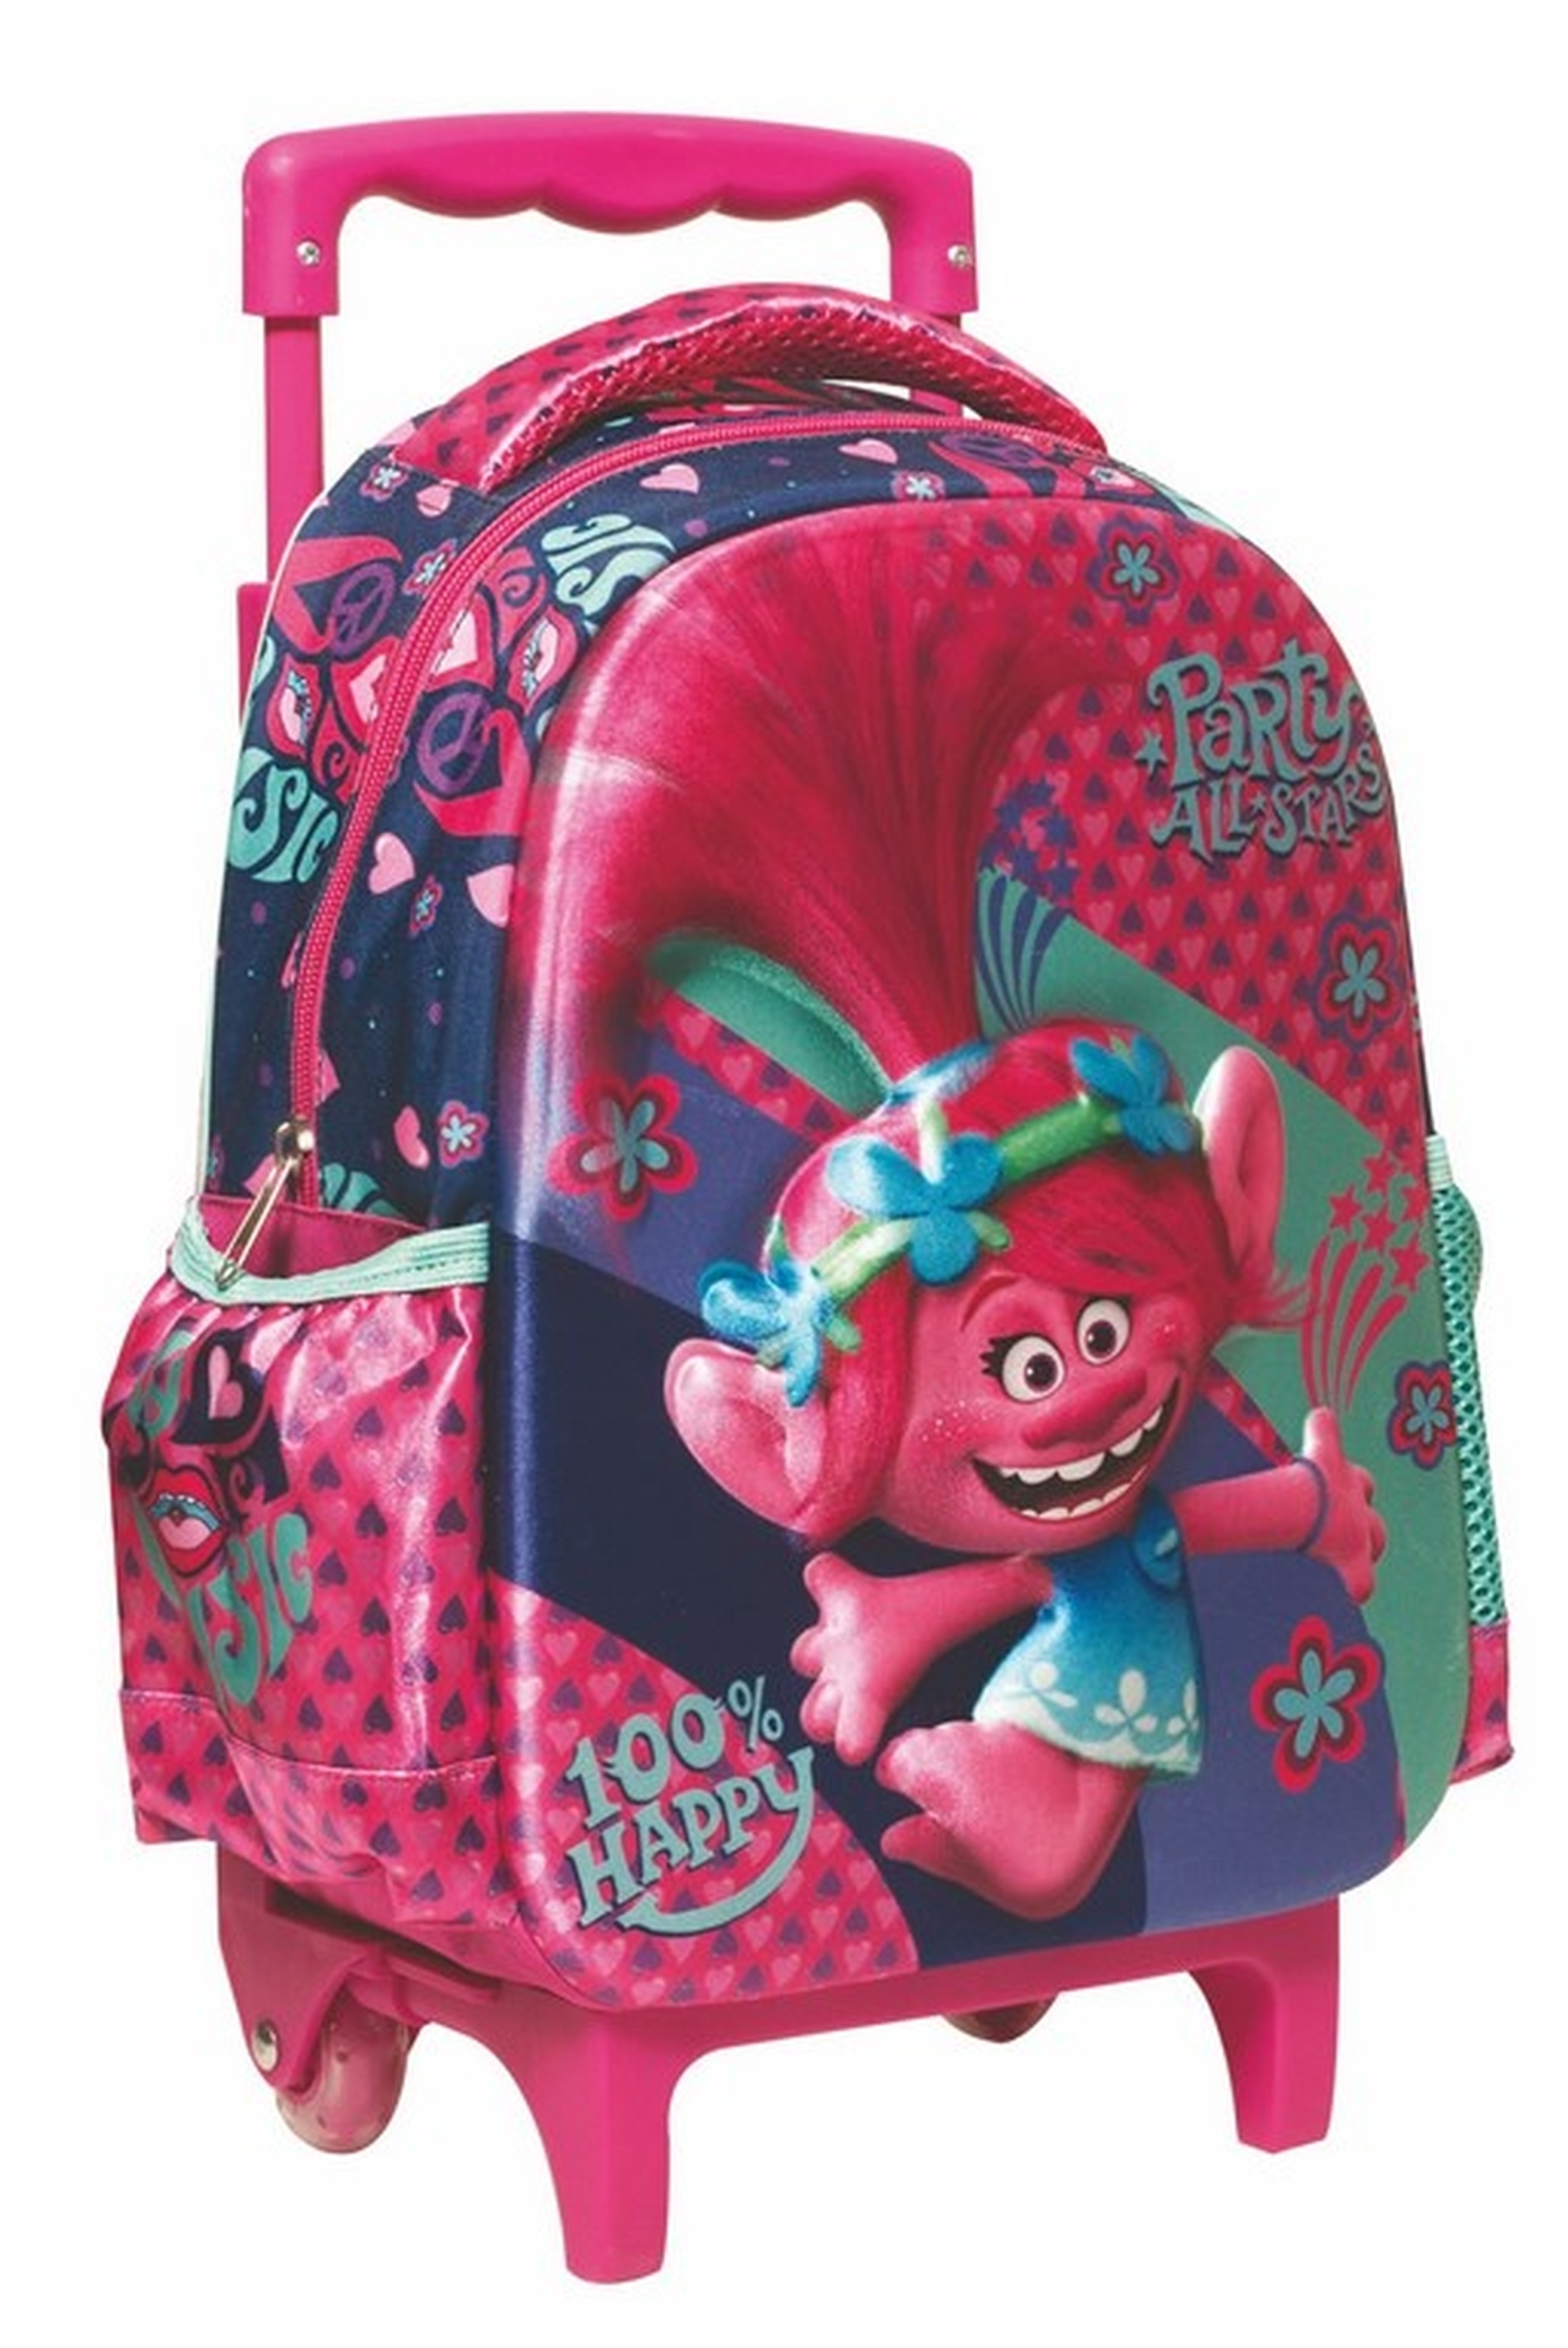 9c91dfa722e Τσάντα τρόλλευ νηπιαγωγείου - Trolls